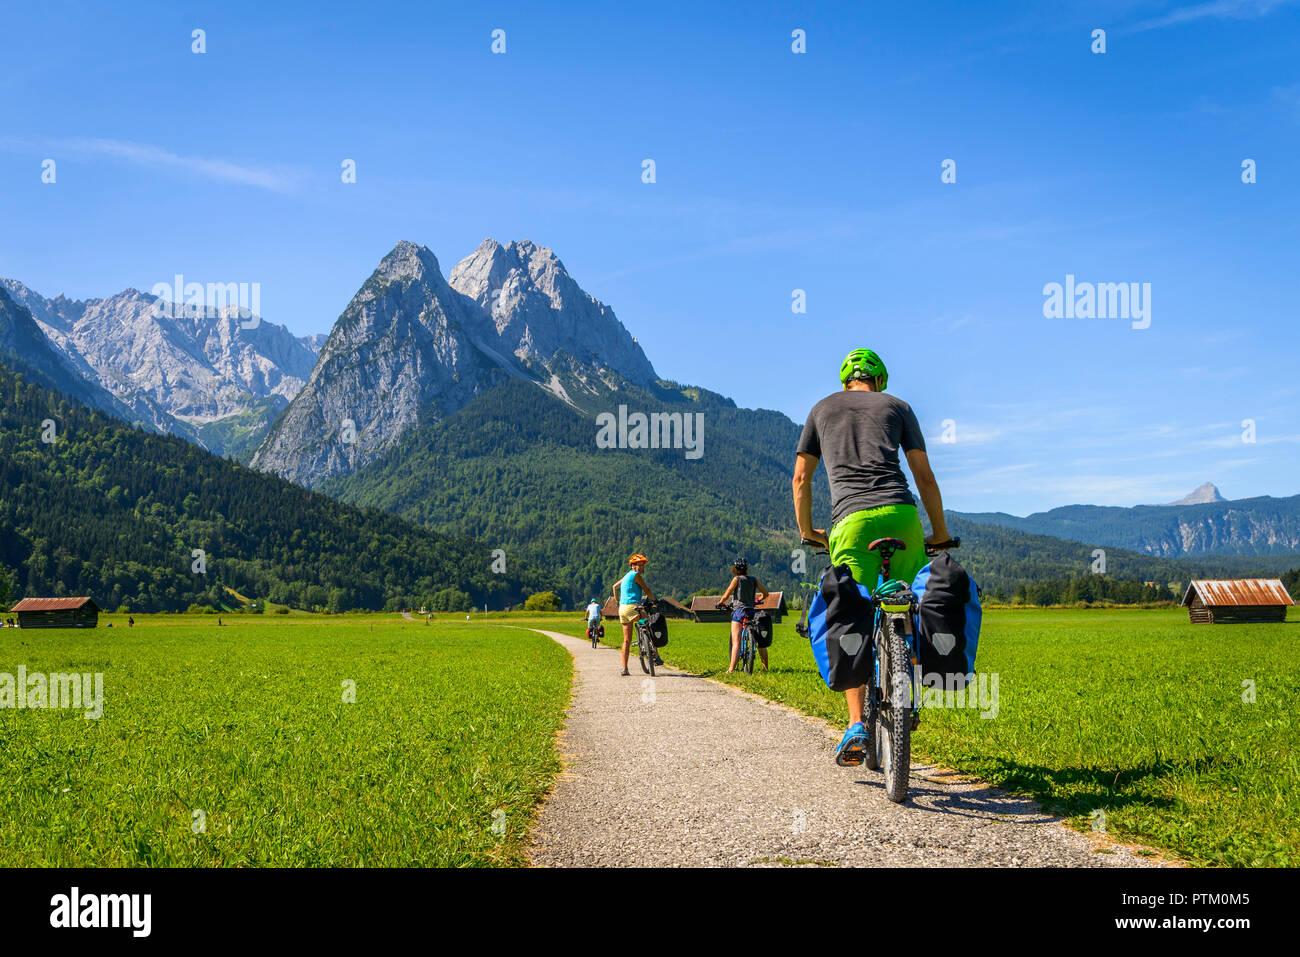 Ciclista en bicicleta Equitación excursión en bicicleta de ruta en su bicicleta de montaña, en la parte de atrás, Tegernauweg Zugspitze, cerca de Grainau Imagen De Stock